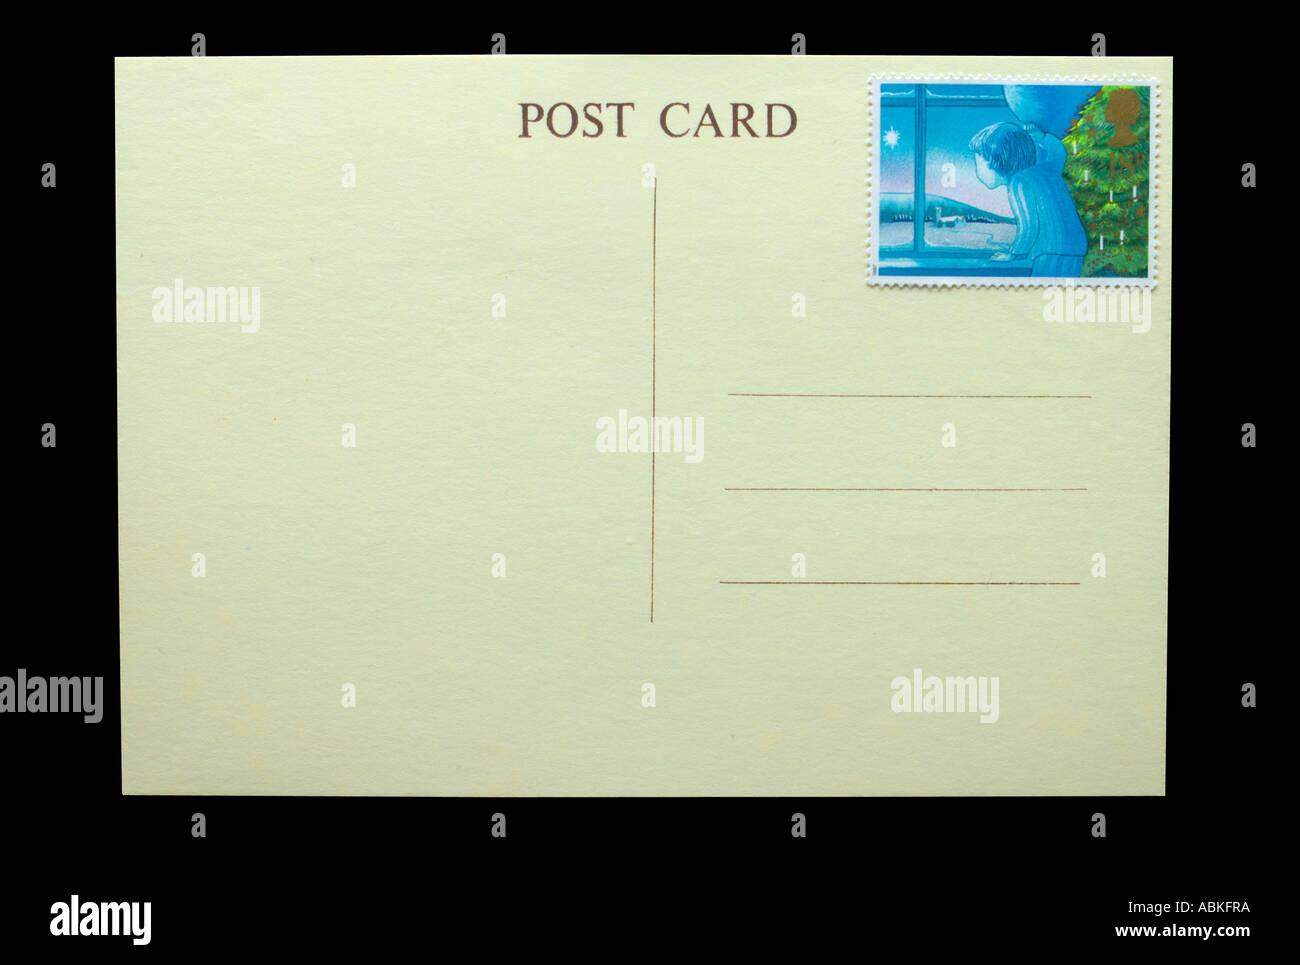 Postcard 1987 - Stock Image